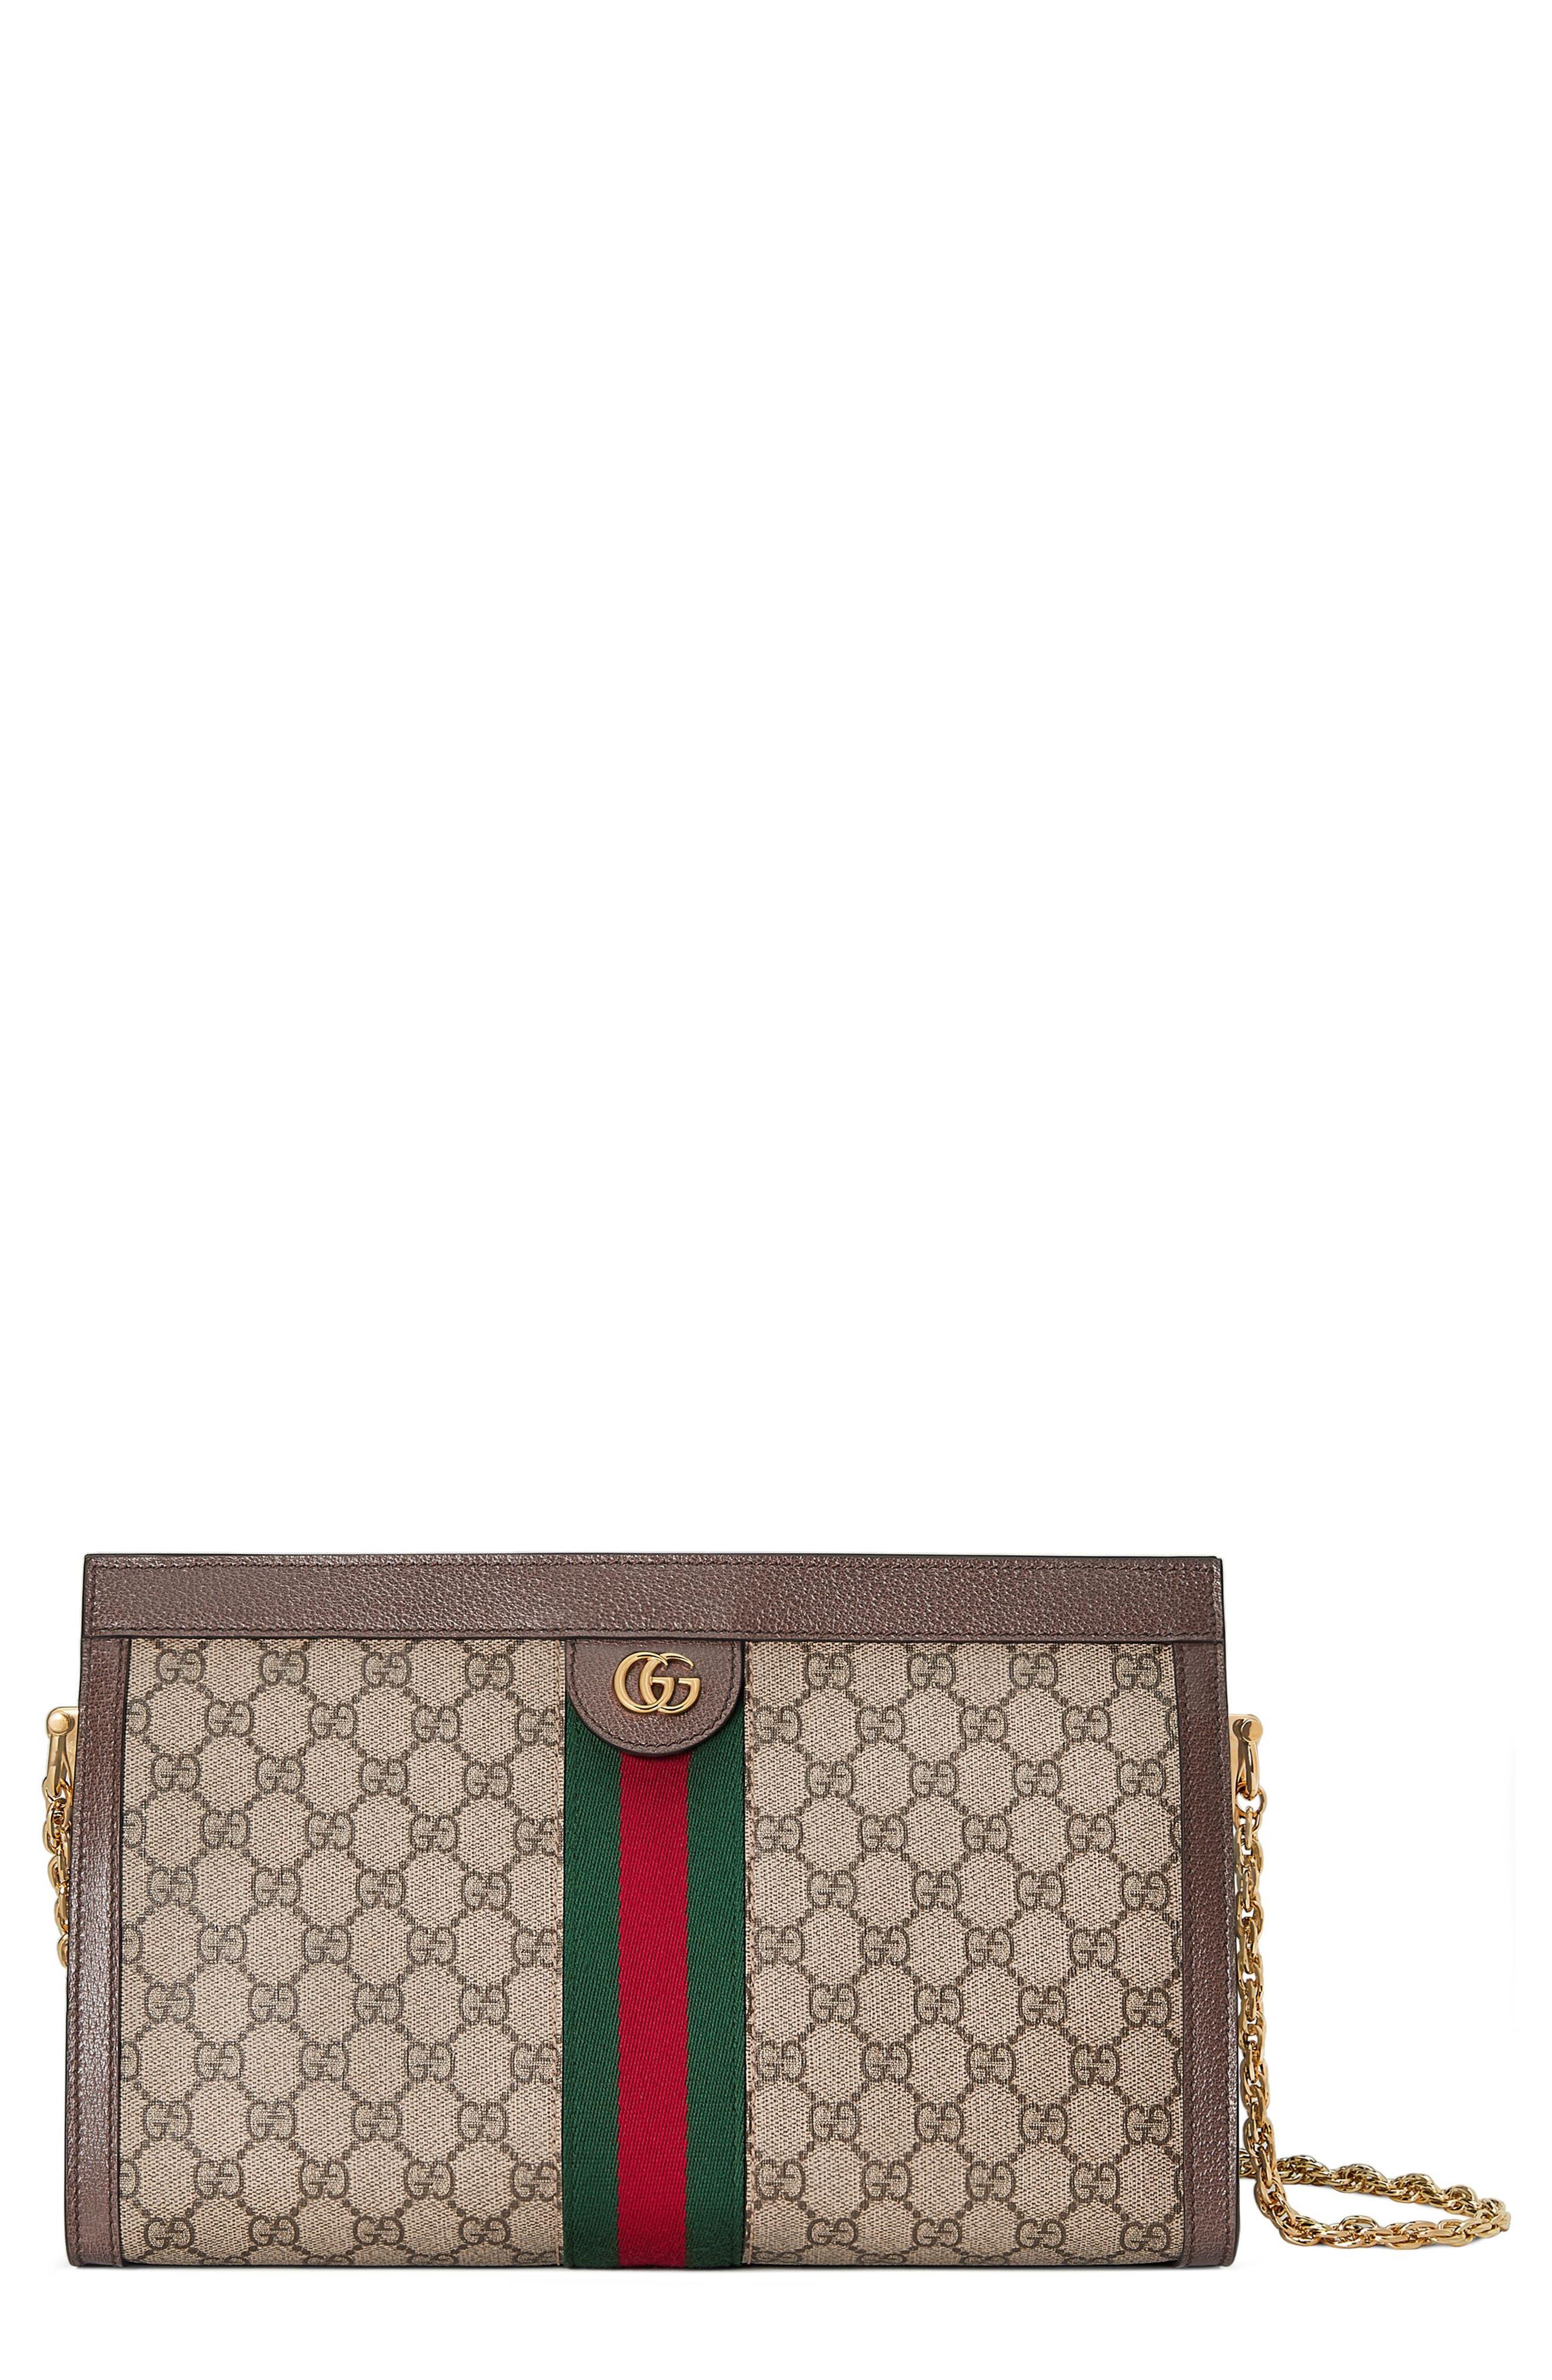 GucciCanvas Shoulder Bag   Nordstrom